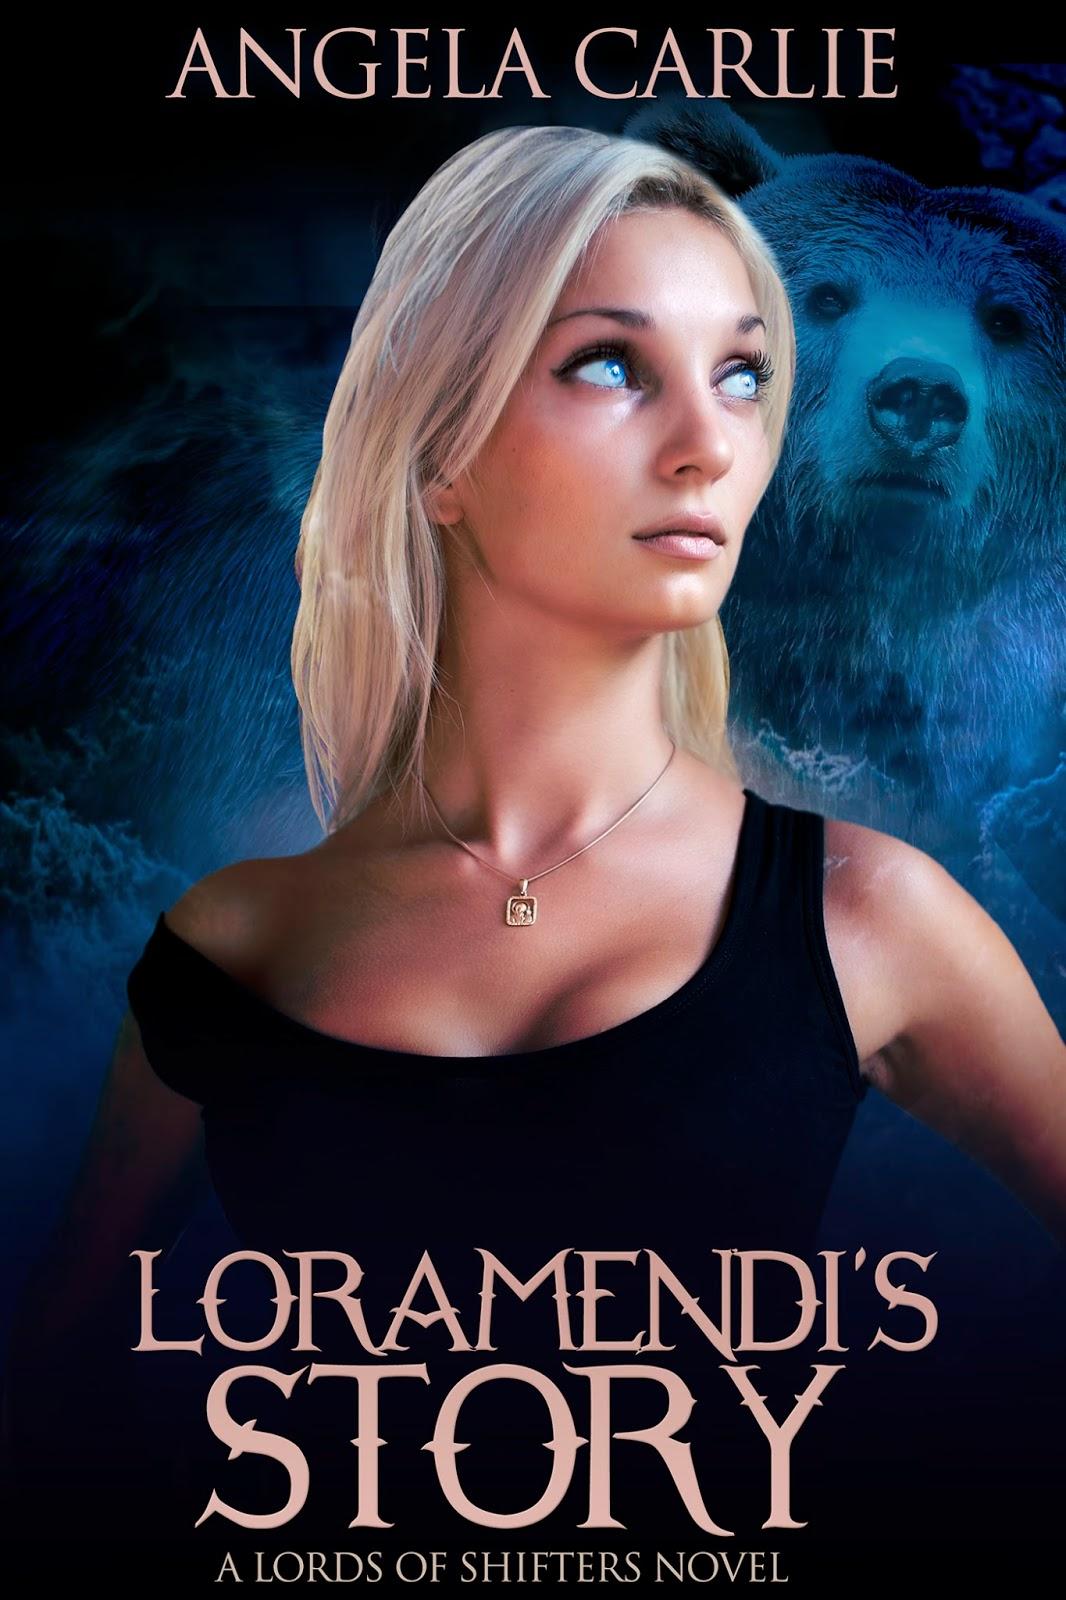 http://www.amazon.com/Loramendis-Story-Shifters-Angela-Carlie-ebook/dp/B005FR1D9U/ref=sr_1_1?ie=UTF8&qid=1401846339&sr=8-1&keywords=Loramendi%27s+Story